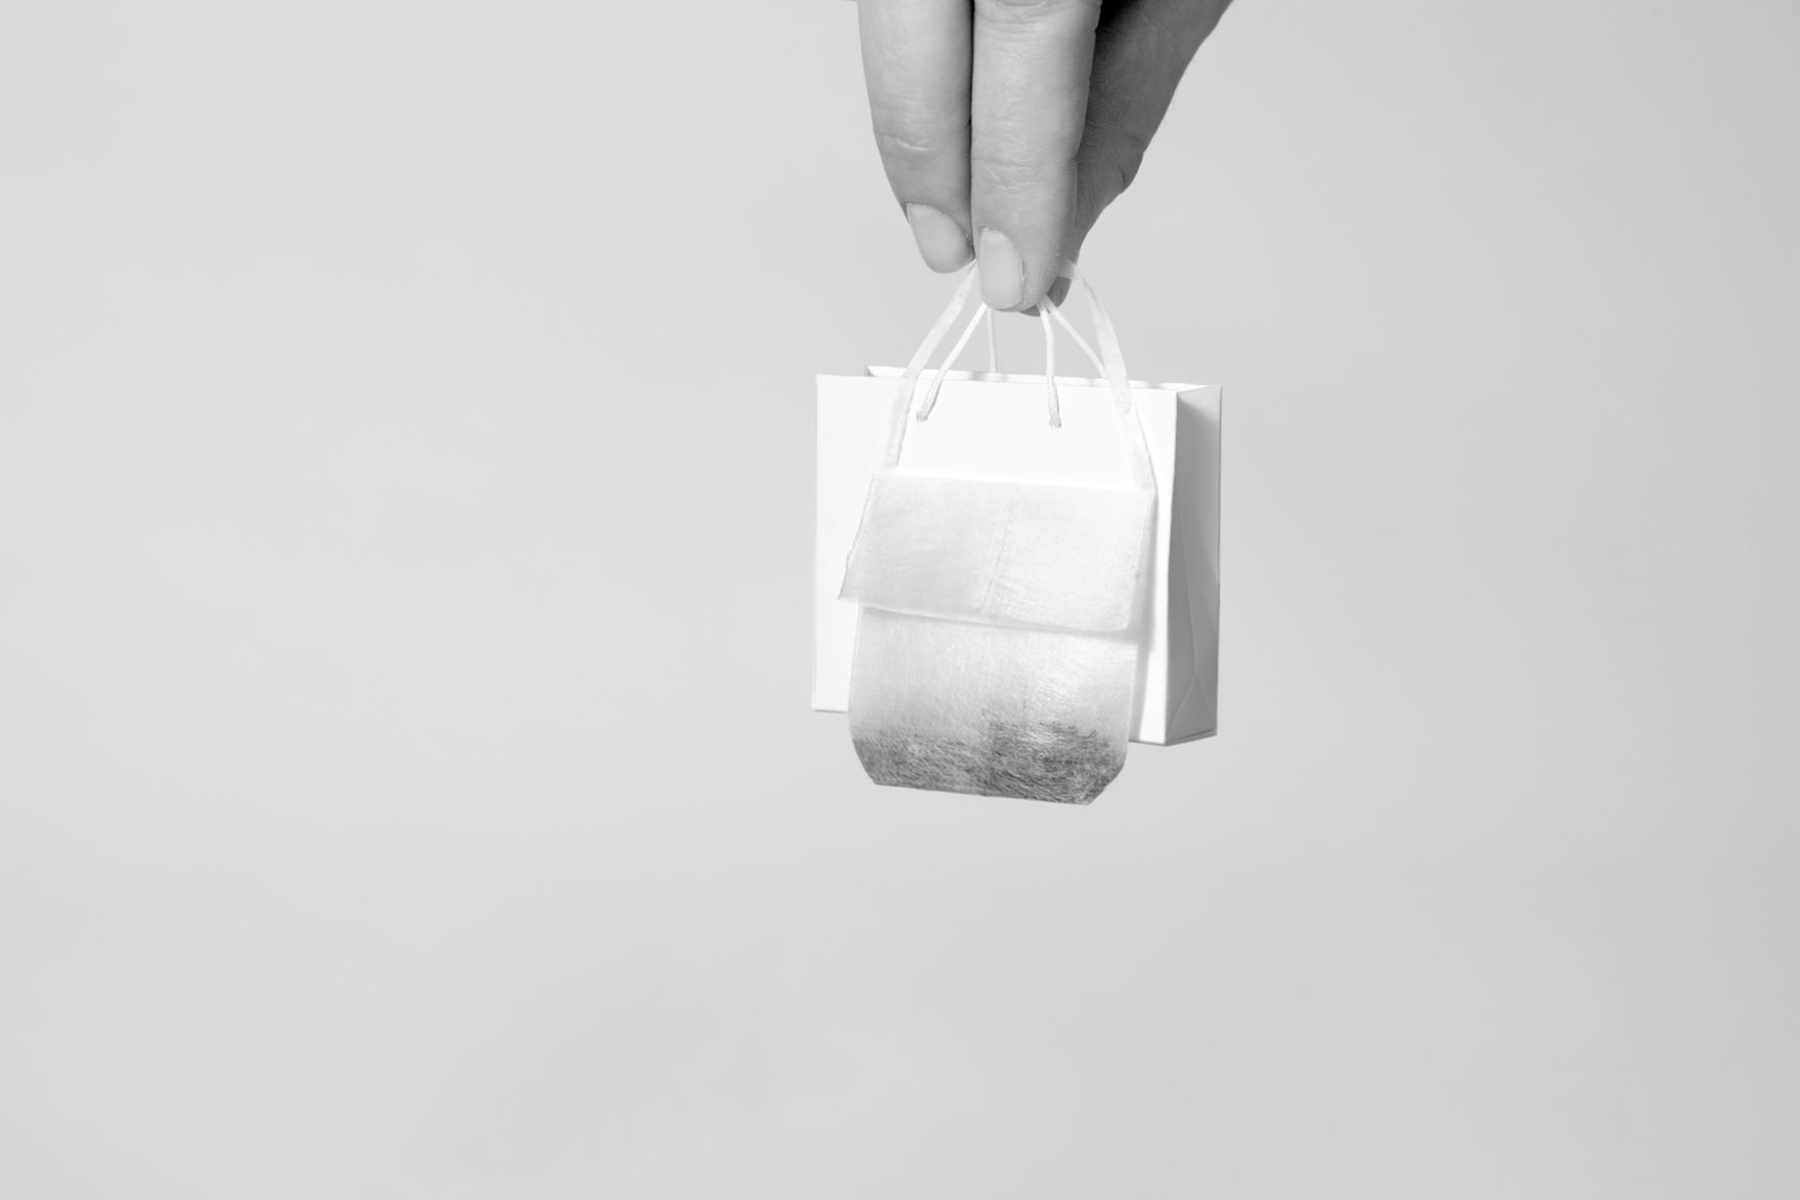 iGNANT-Design-Halssen-&-Lyon-Ayzit-Bostan-The-Teabag-Collection-05